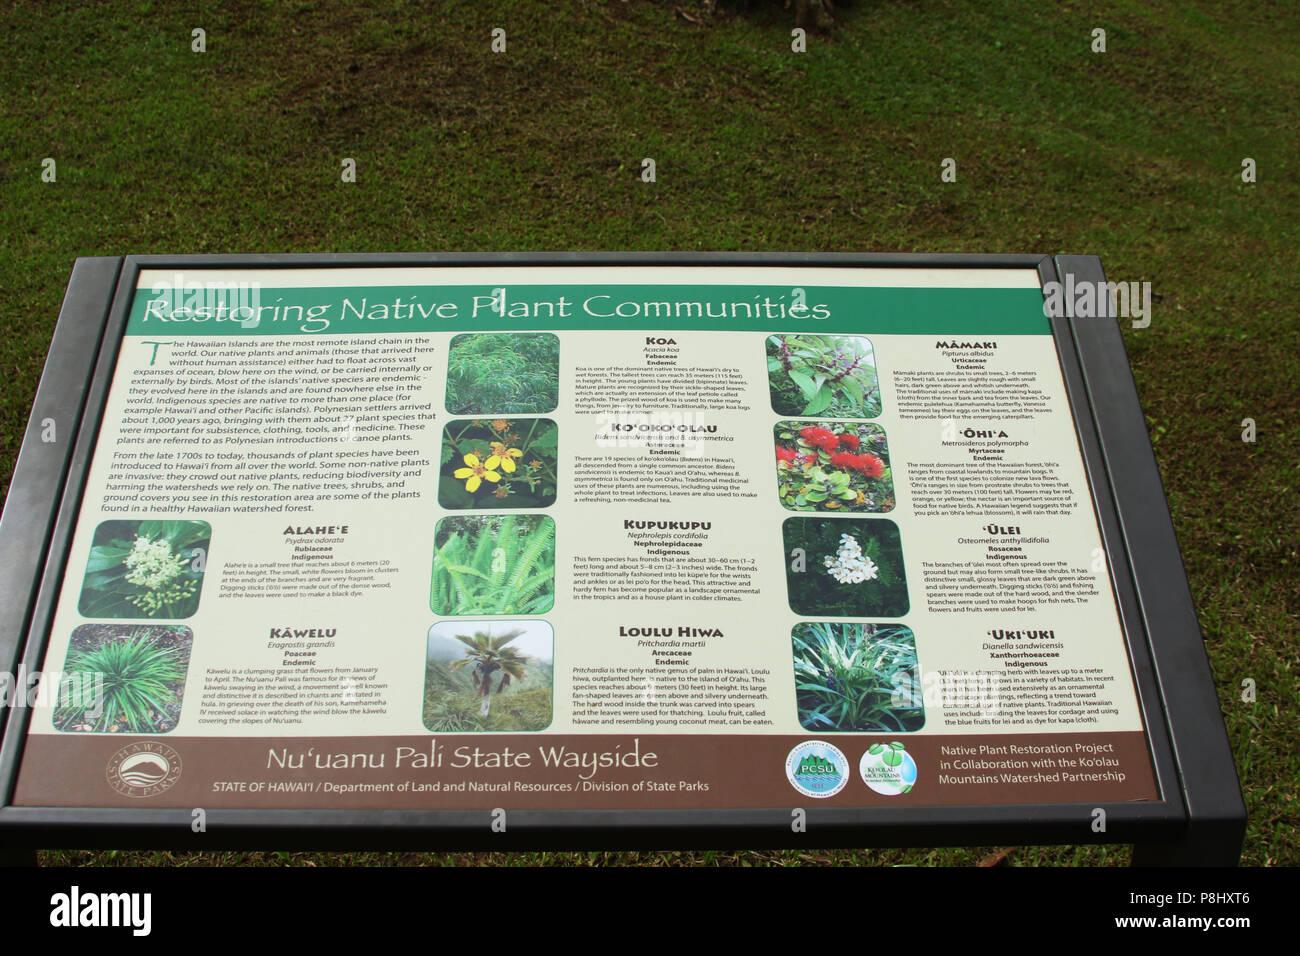 Restoring Native Plant Communities. Tourist educational sign at Nu'Uanu Pali Lookout. Oahu Island, Hawaii, USA. - Stock Image